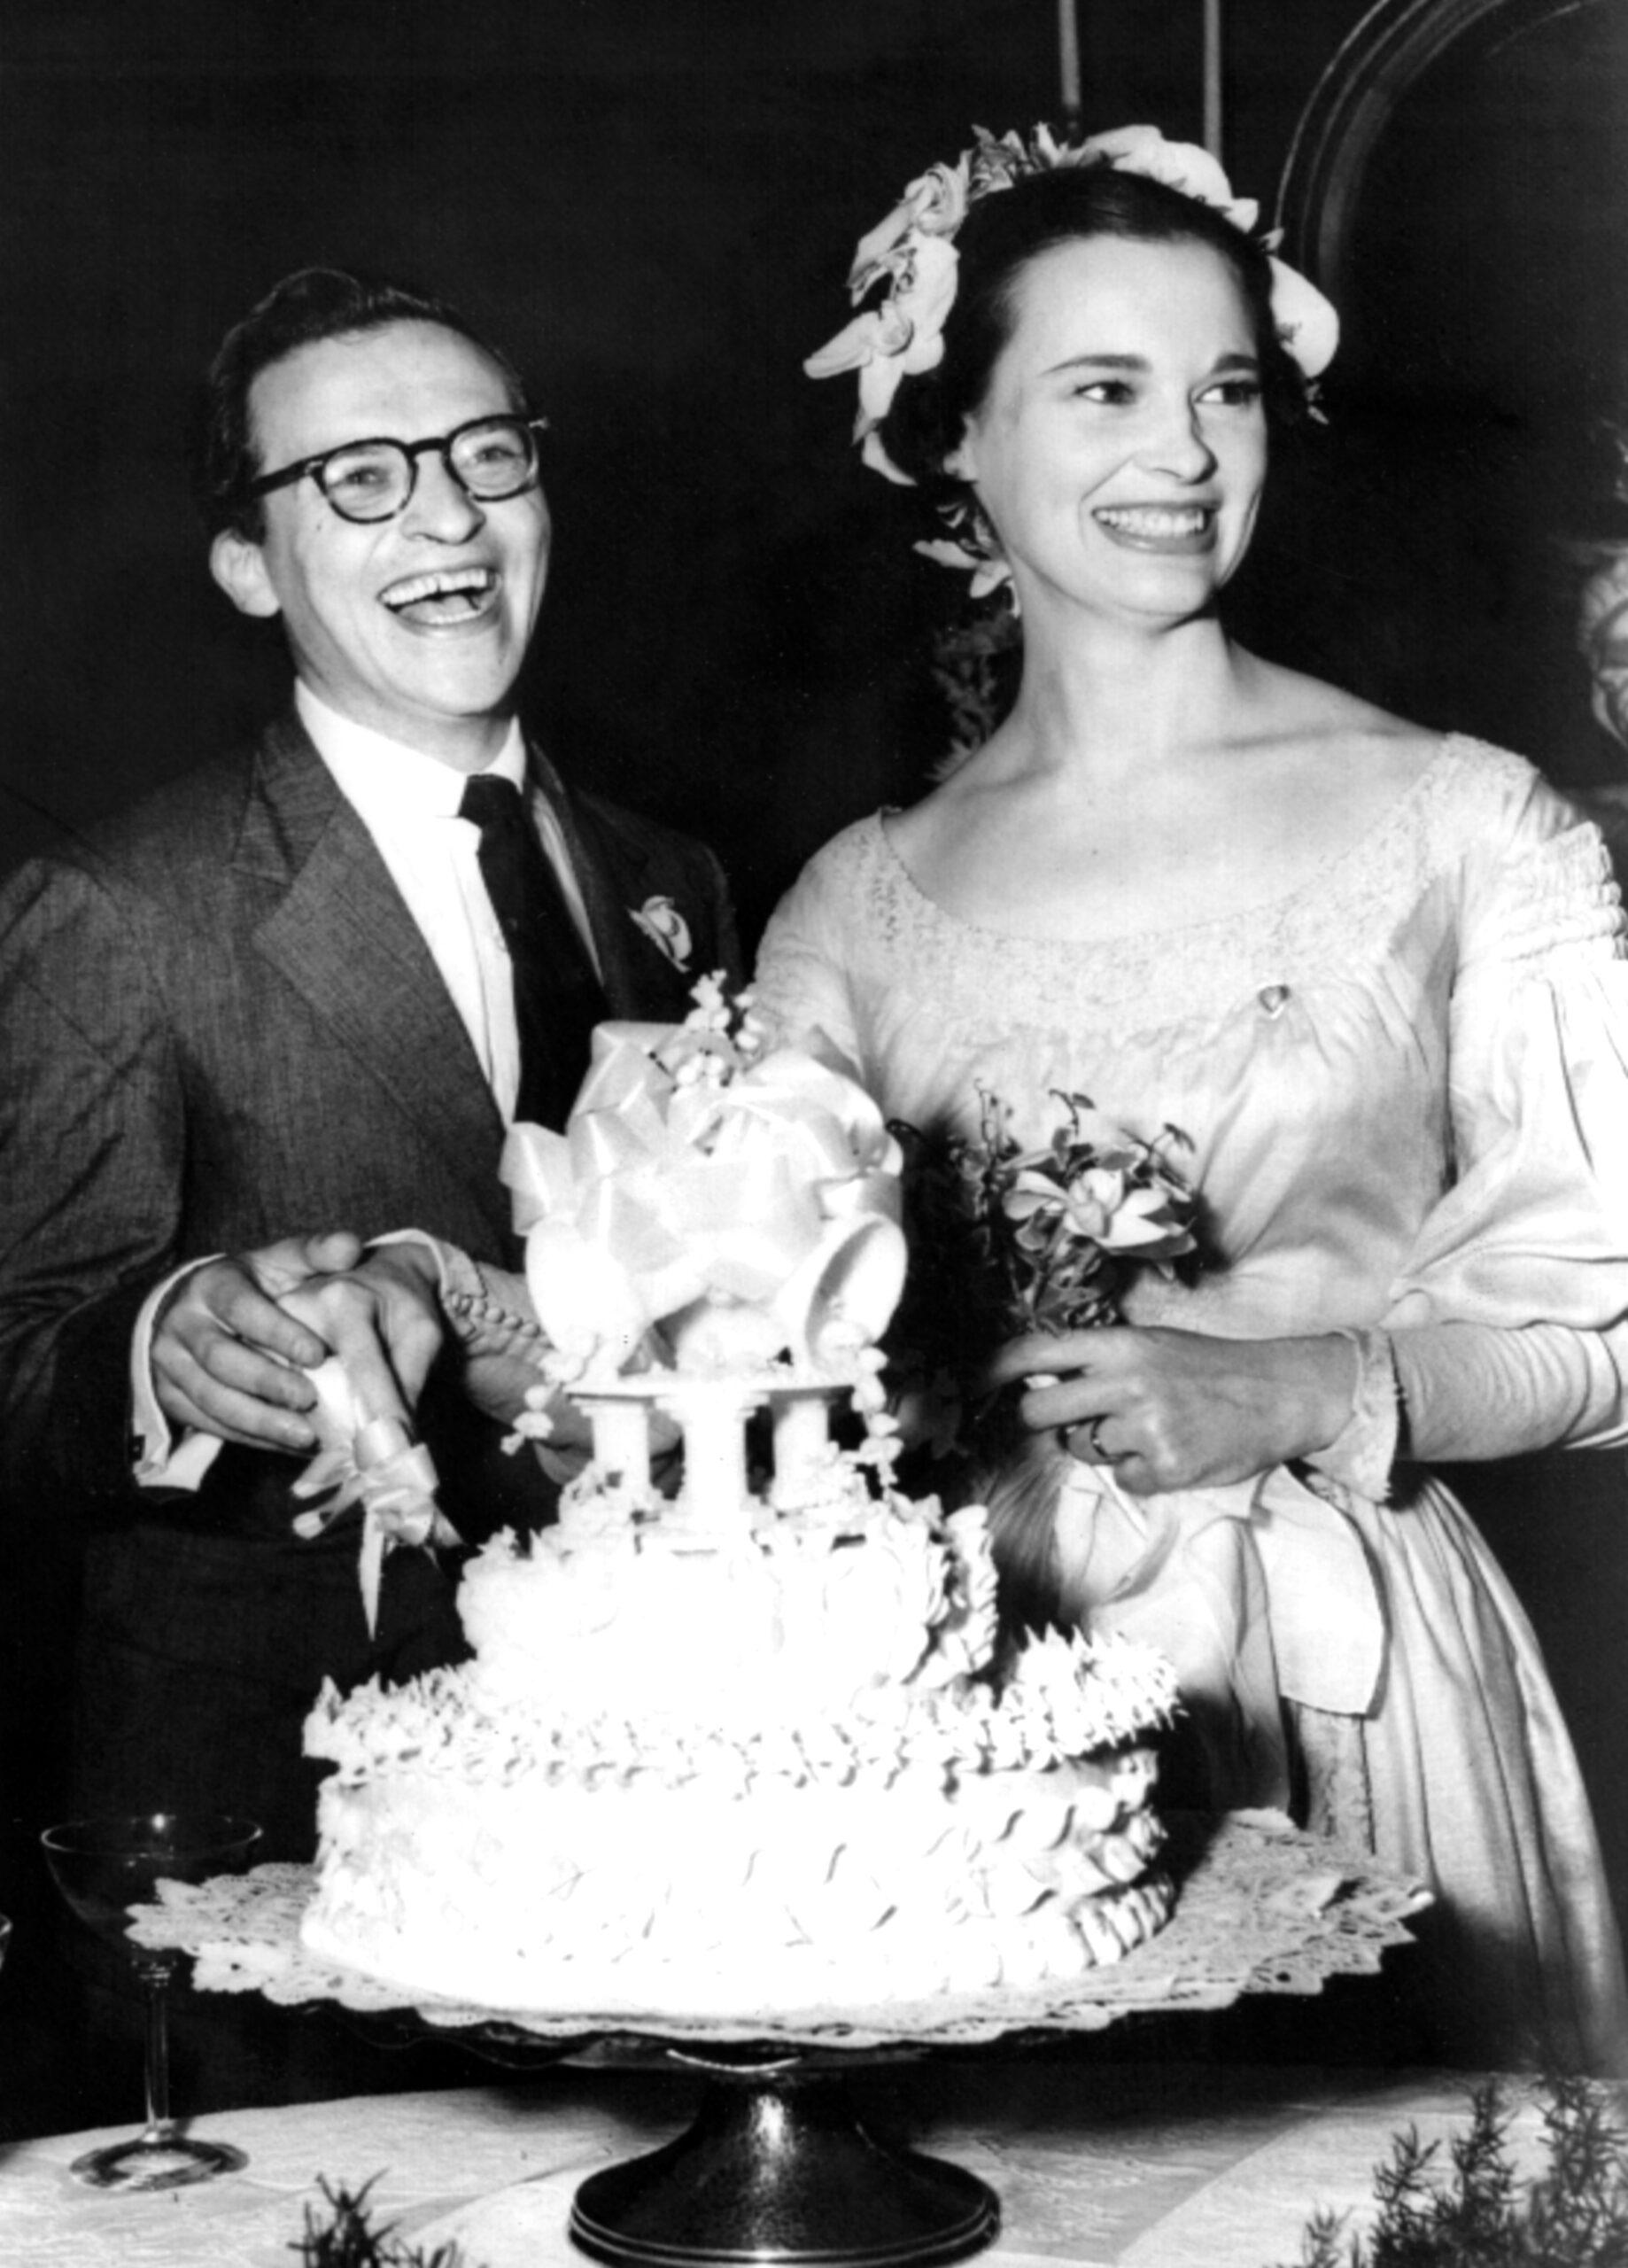 Gloria Vanderbilt Sidney Lumet wedding